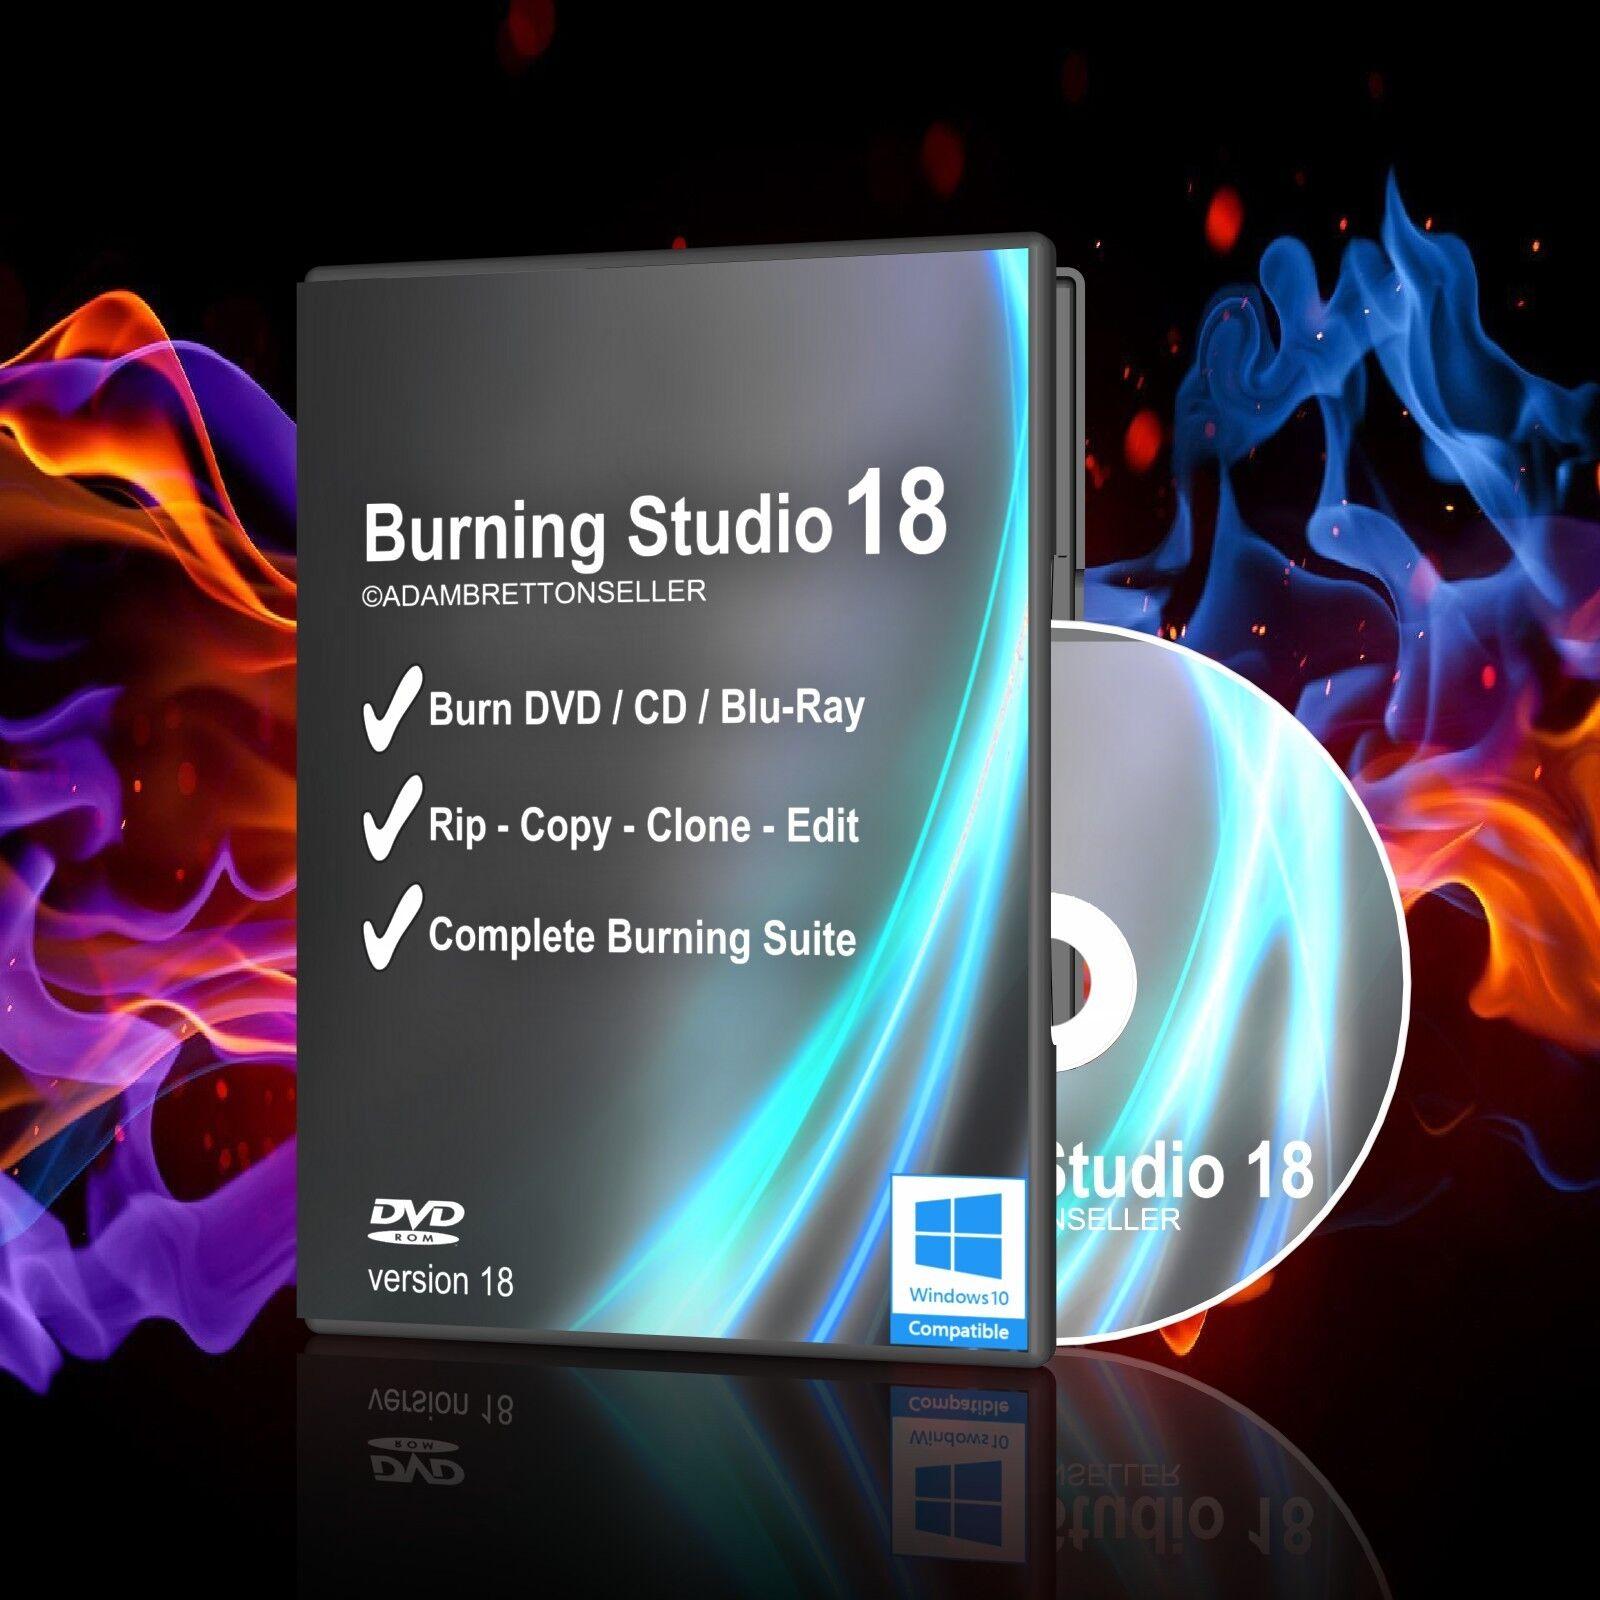 DVD/CD Burning Software - Copy/Clone/Backup/Edit/Burner/Ripper